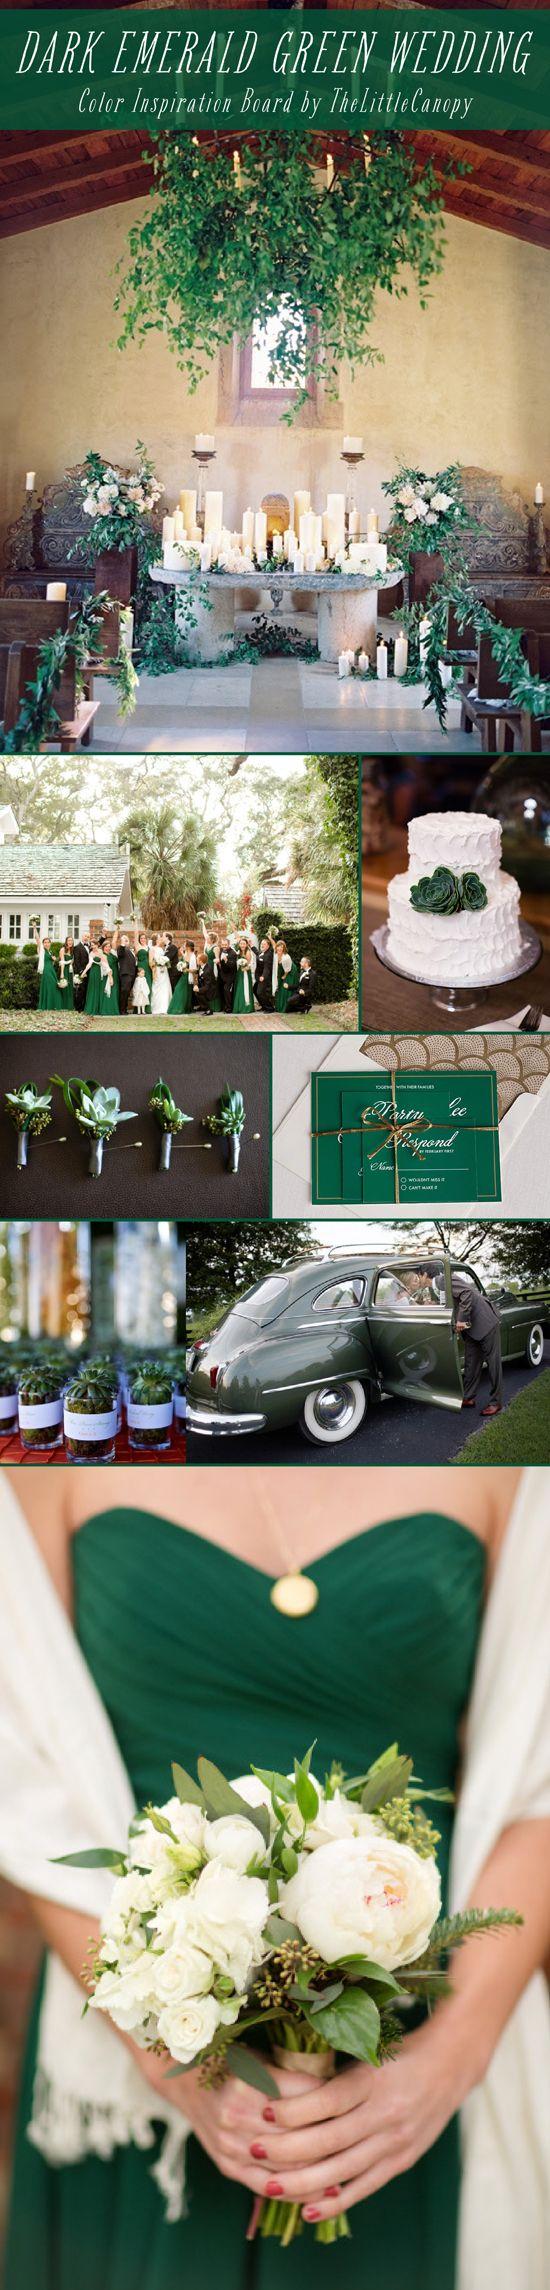 Wedding Inspiration Board Dark Emerald Green Color Theme